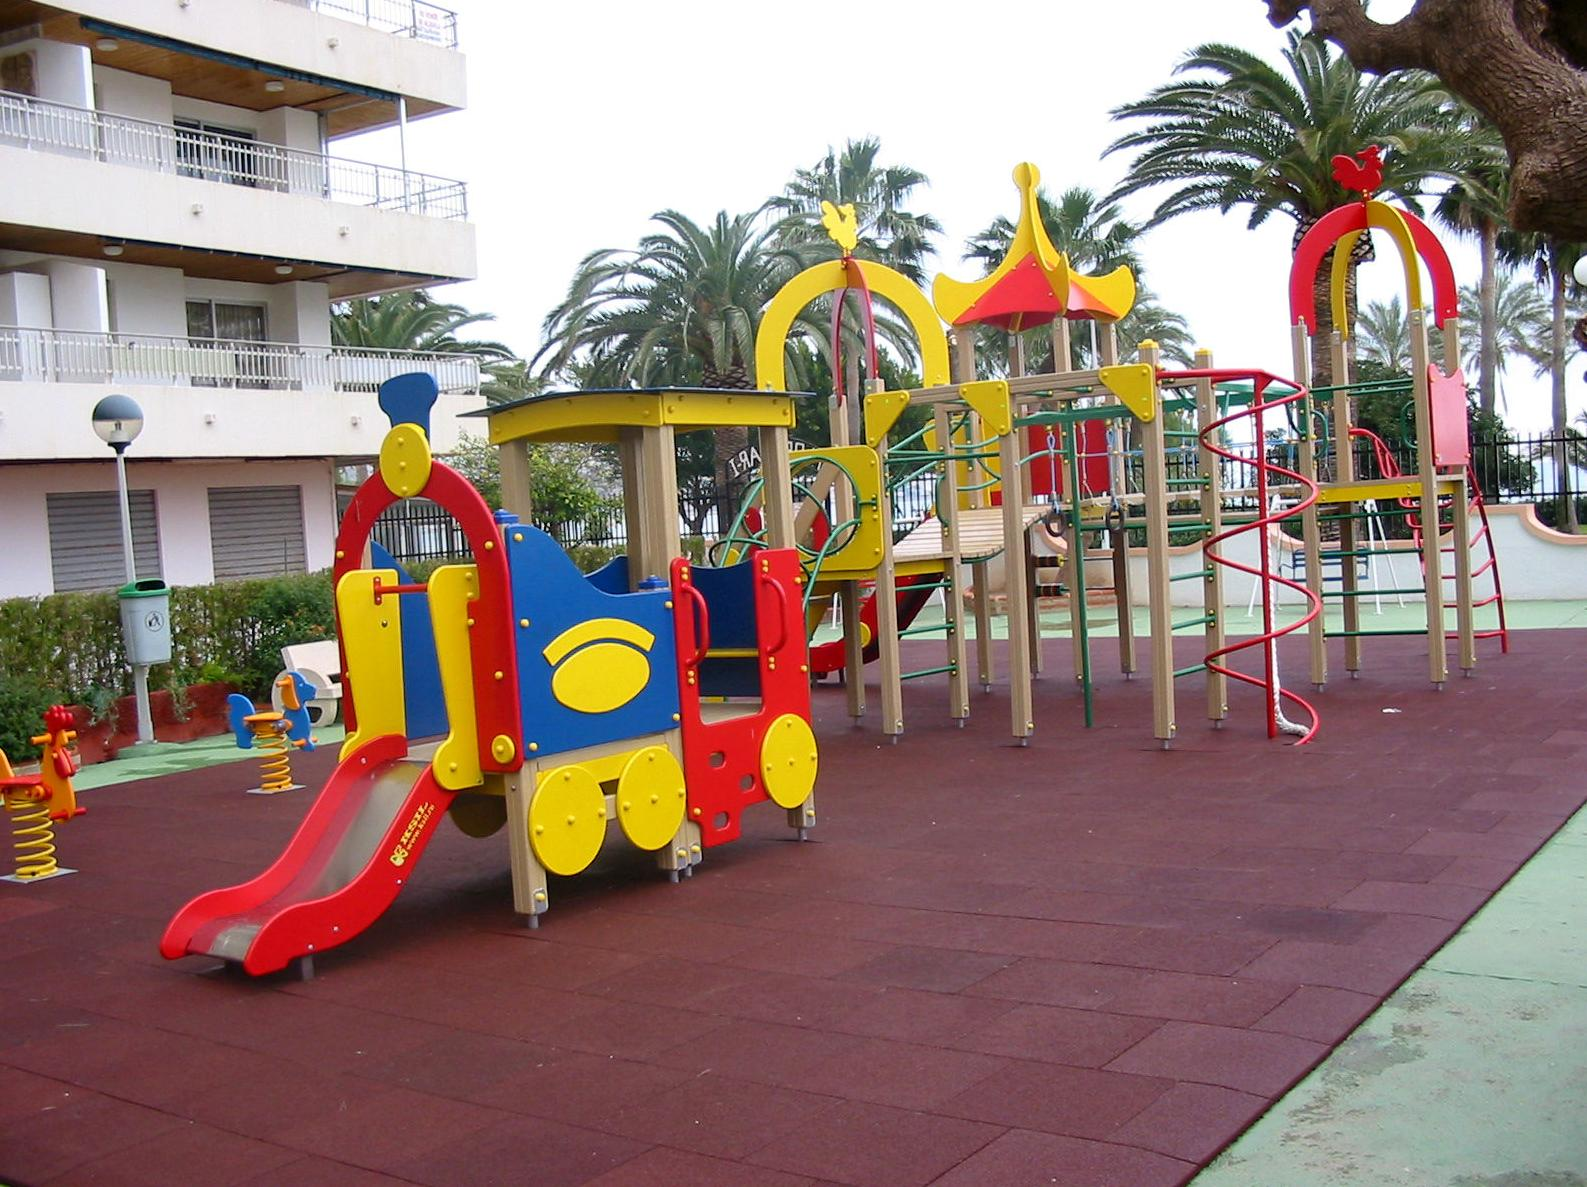 Suelos de caucho en parques infantiles